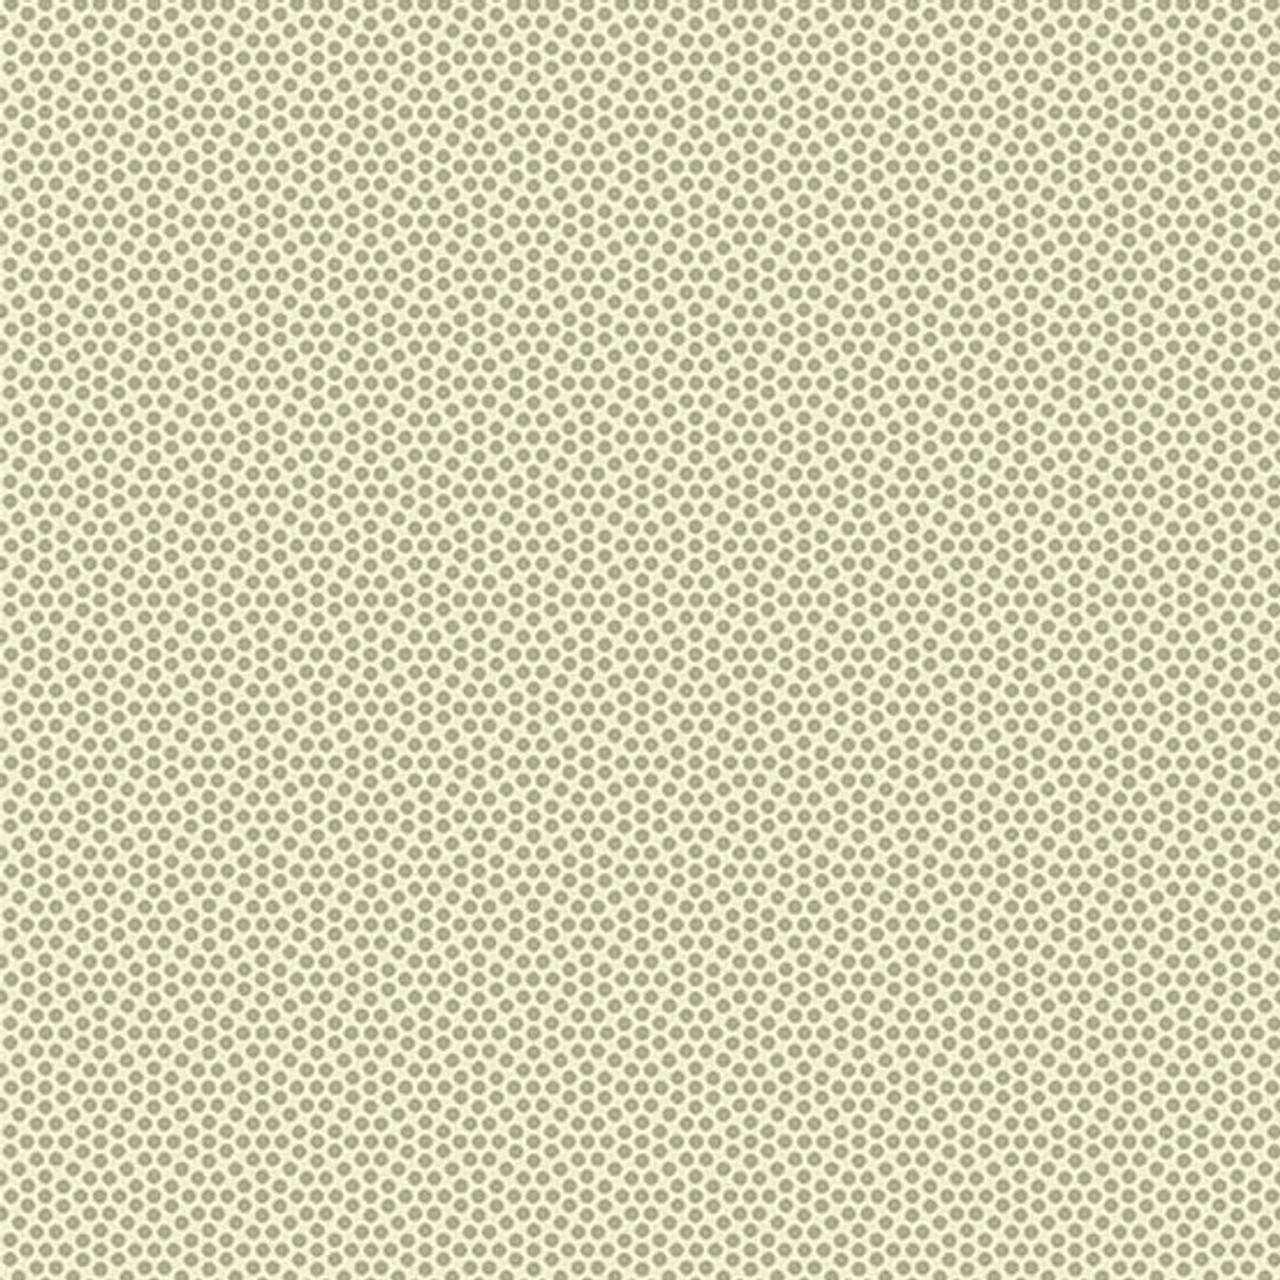 Edyta Sitar, Laundry Basket Quilts : The Seamstress, Trim - Vintage Linen